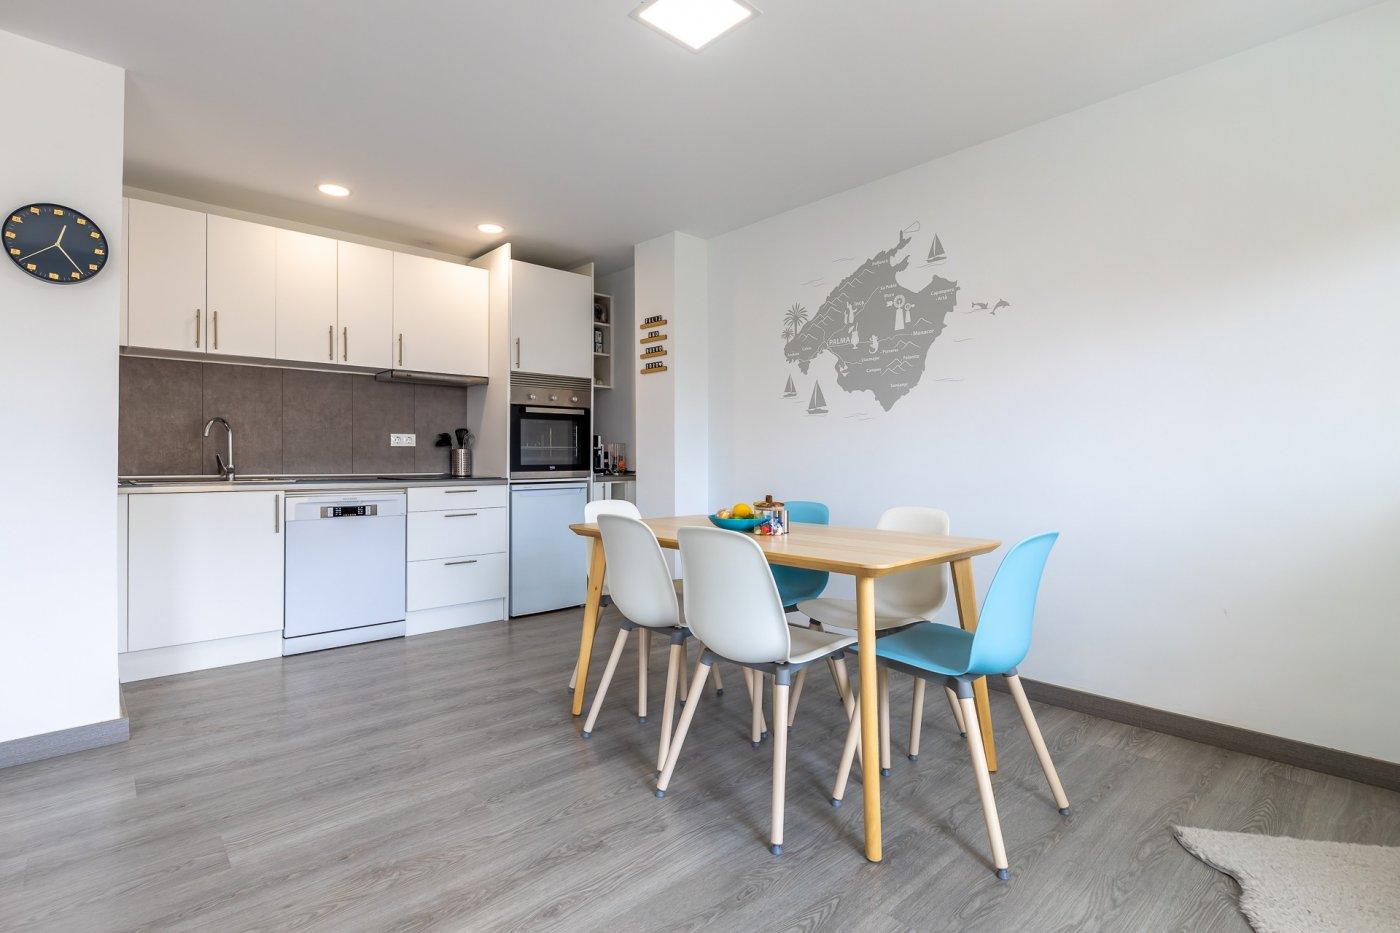 Acogedor piso en zona foners, palma - imagenInmueble8